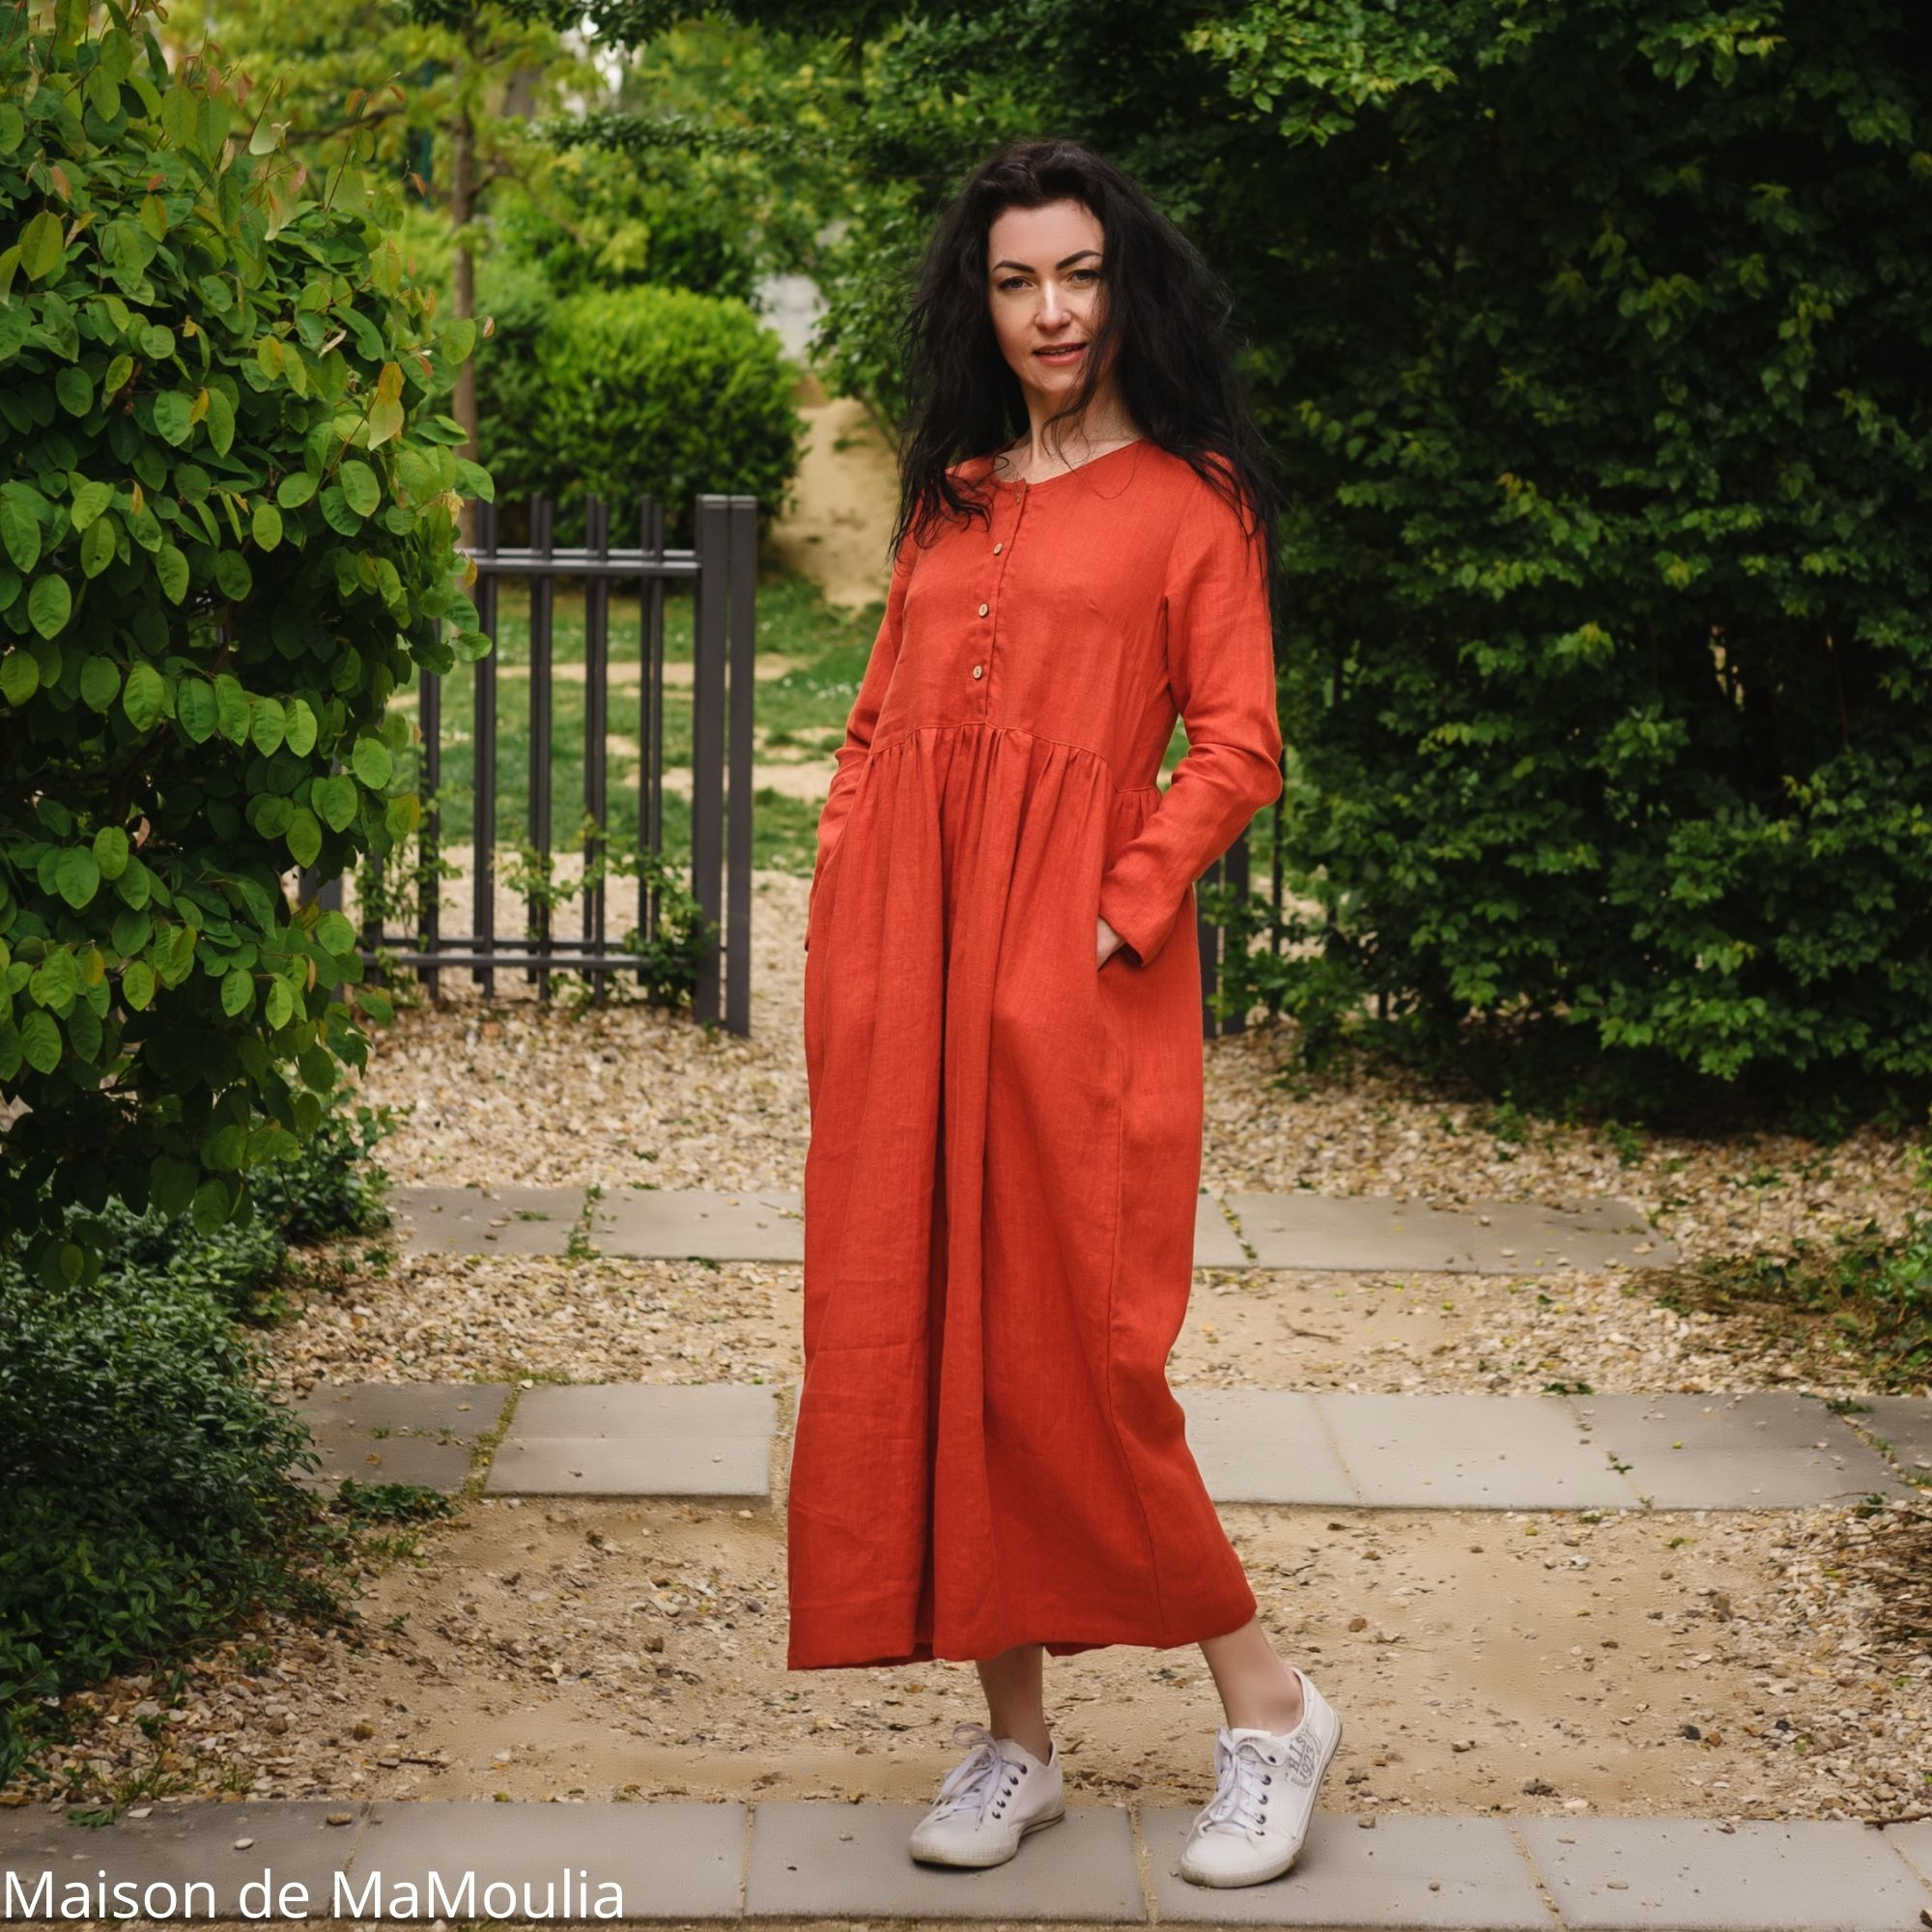 SIMPLY GREY - Robe très longue Boho femme - 100% lin lavé - Rouge